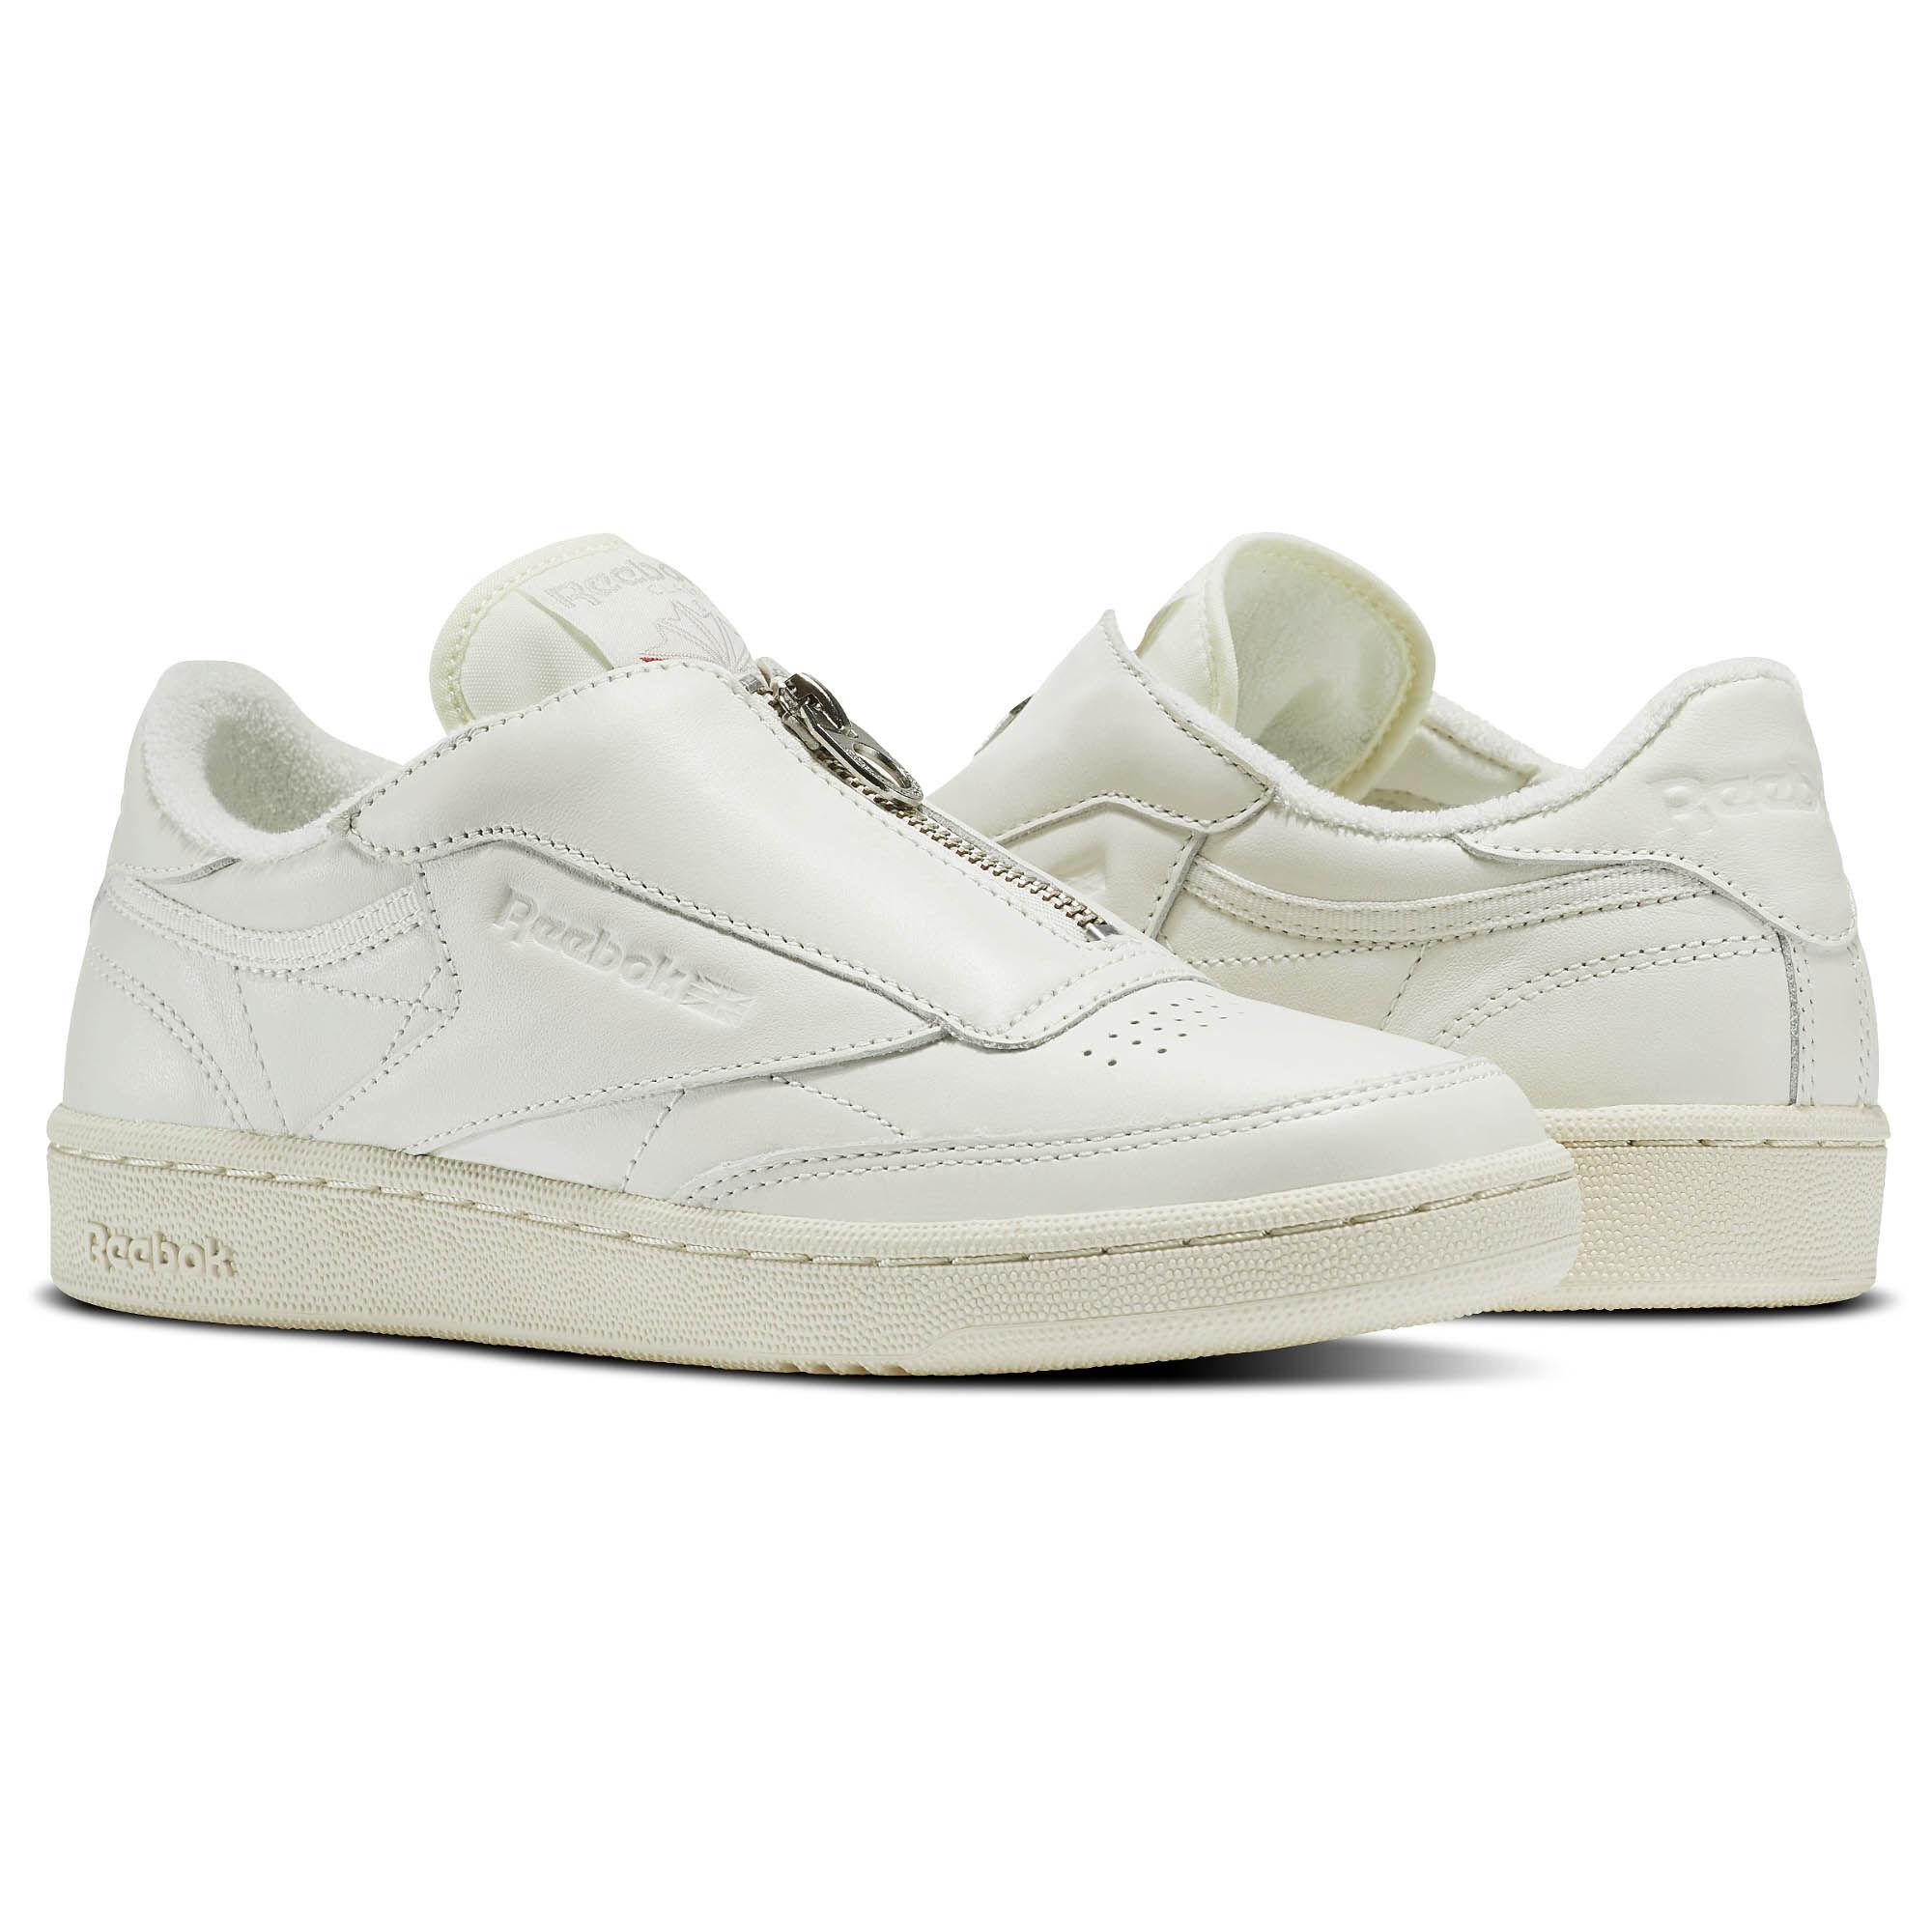 Buy Chalk Sandstone Reebok Club C 85 Zip Womens Shoes